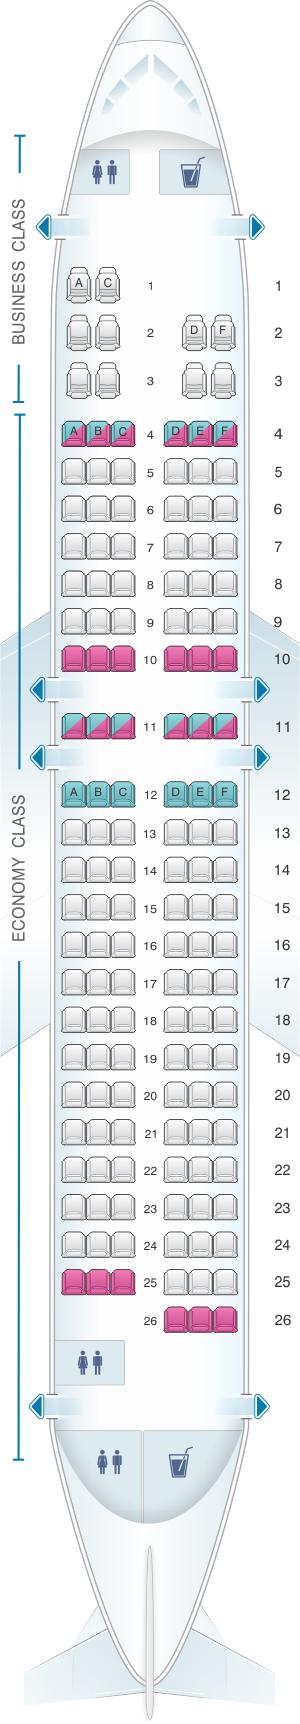 Plan De Cabine Egyptair Airbus A320 232 Seatmaestro Fr